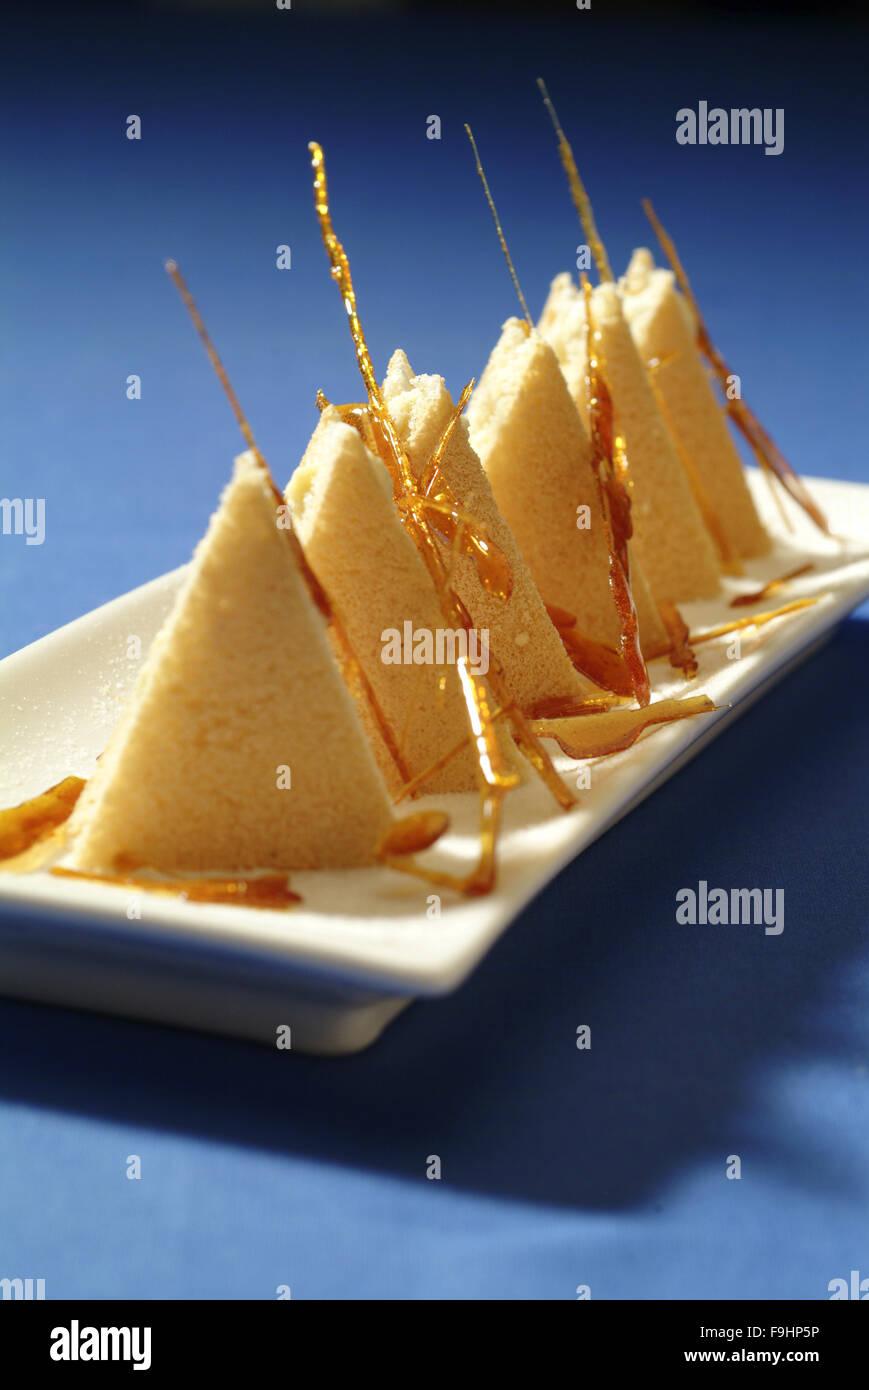 Caramel Triangles - Stock Image